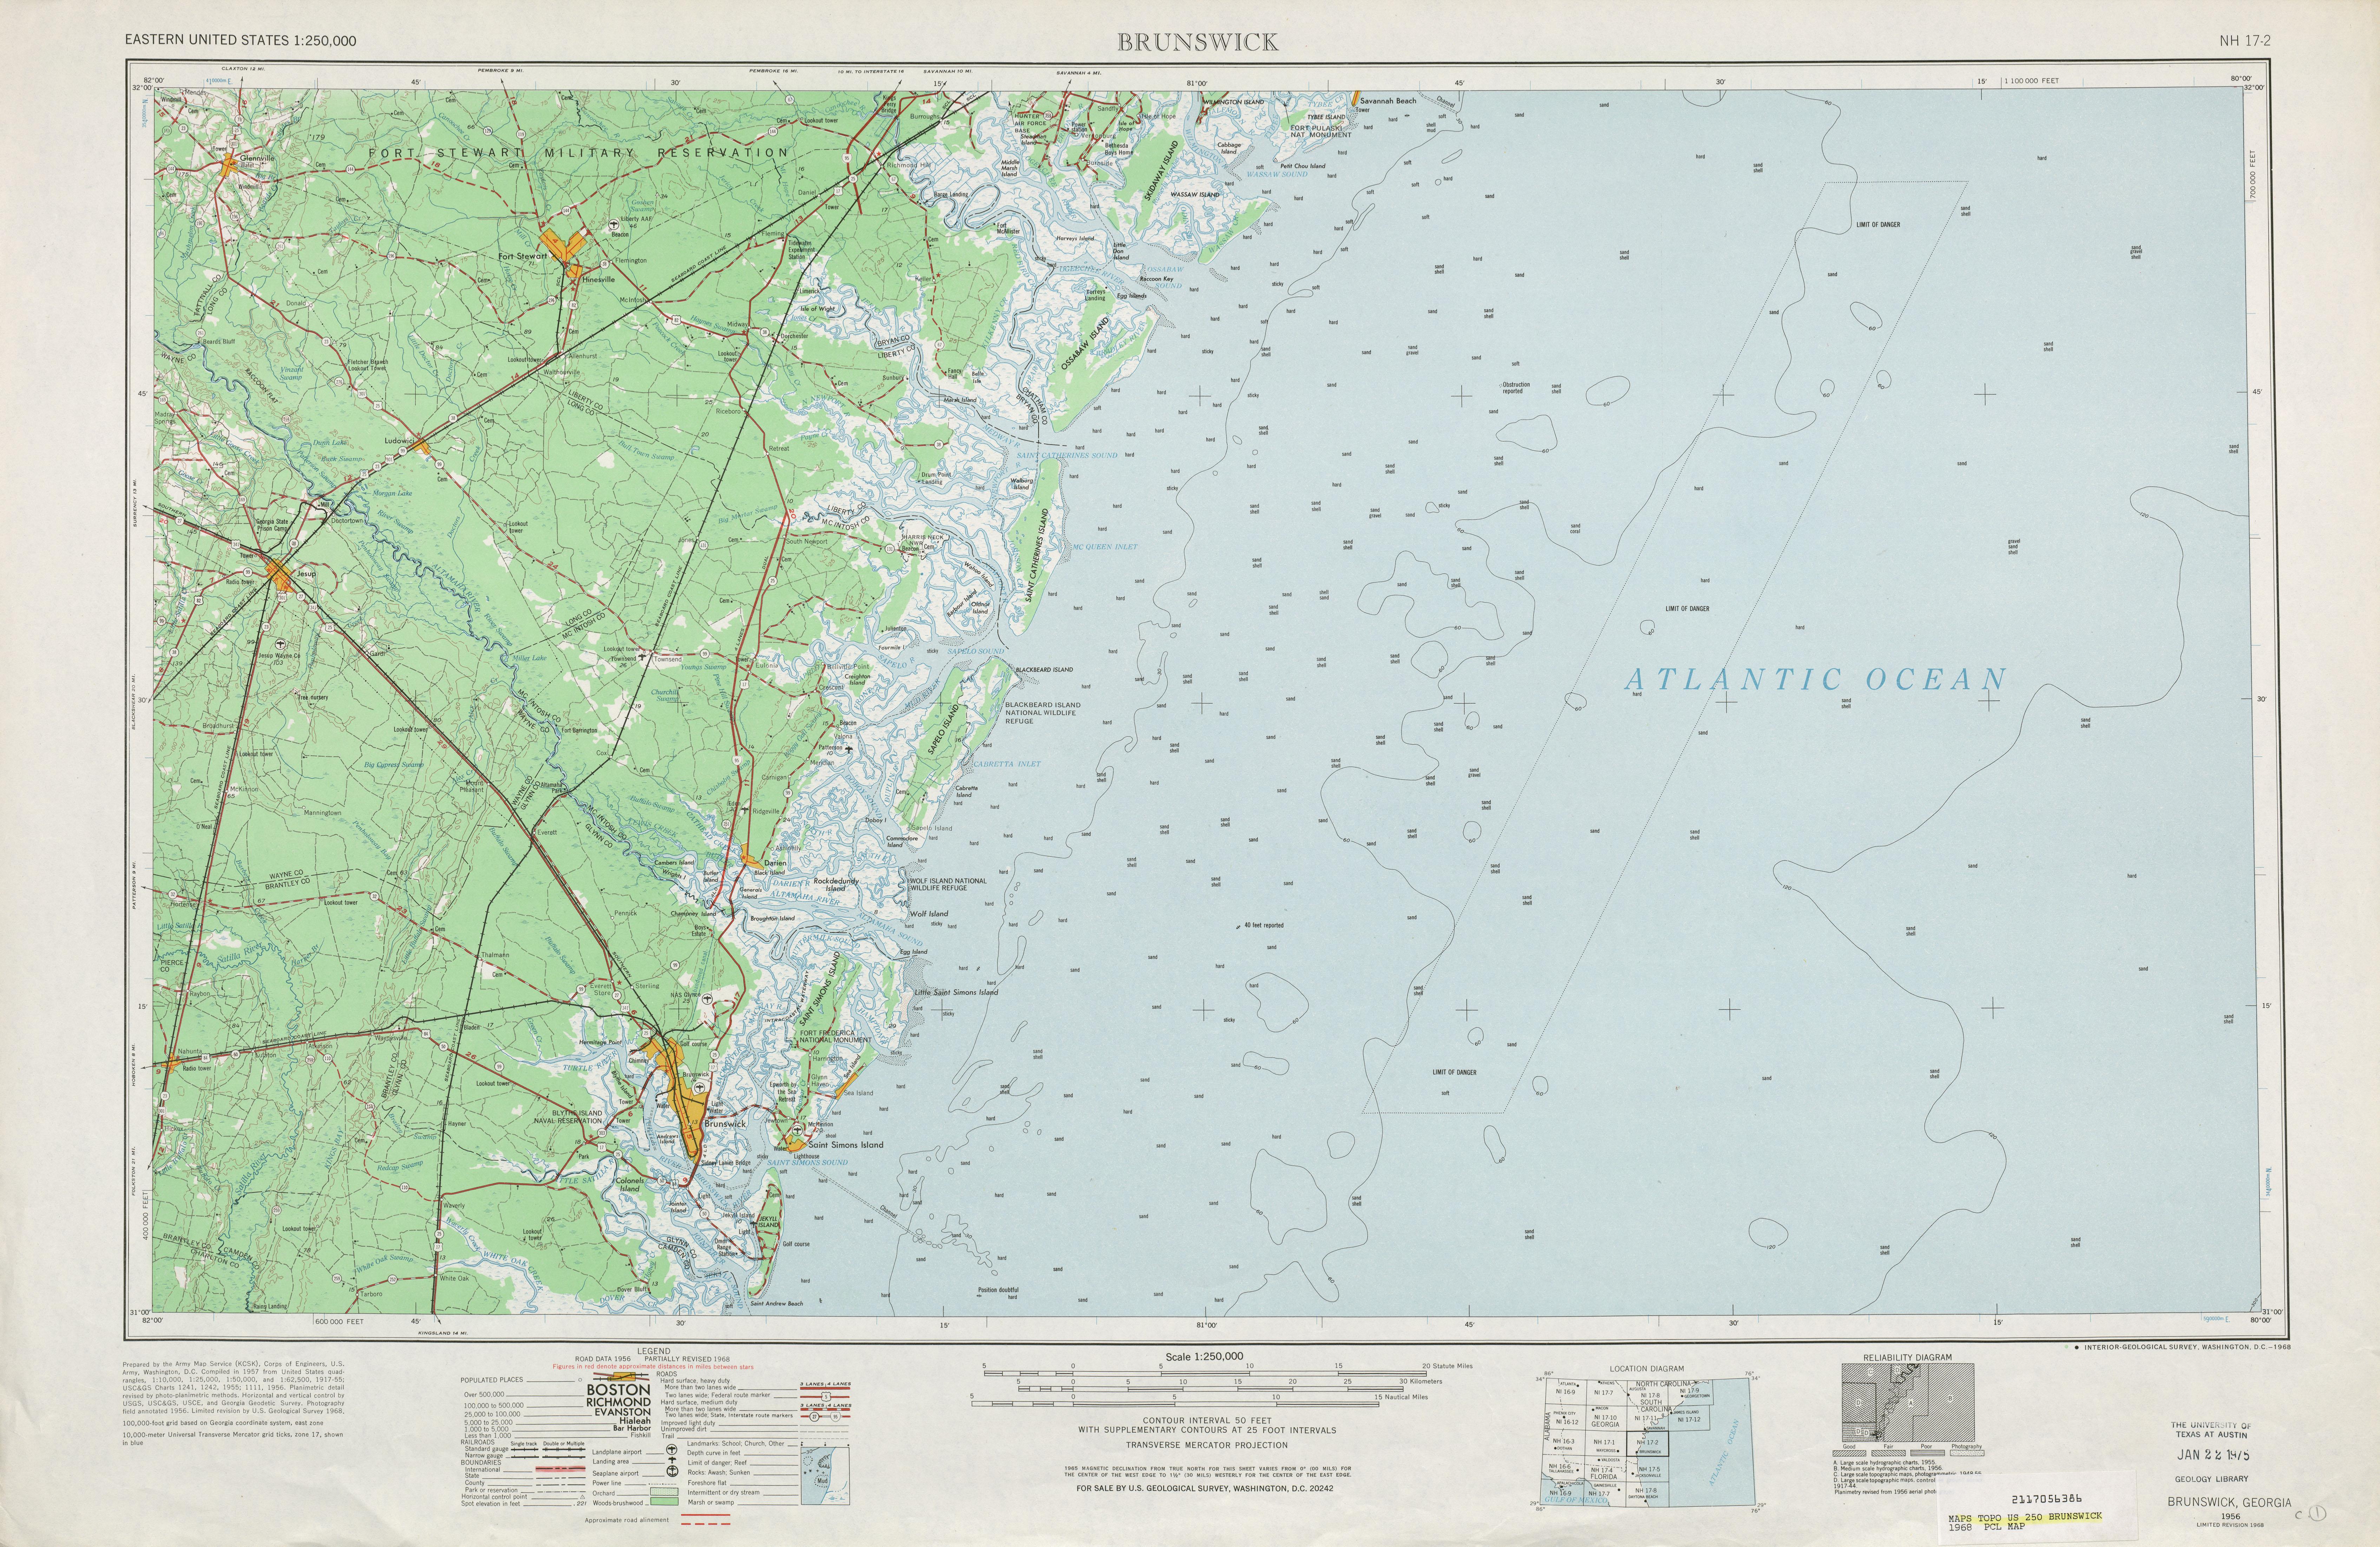 Brunswick Topographic Map Sheet, United States 1968